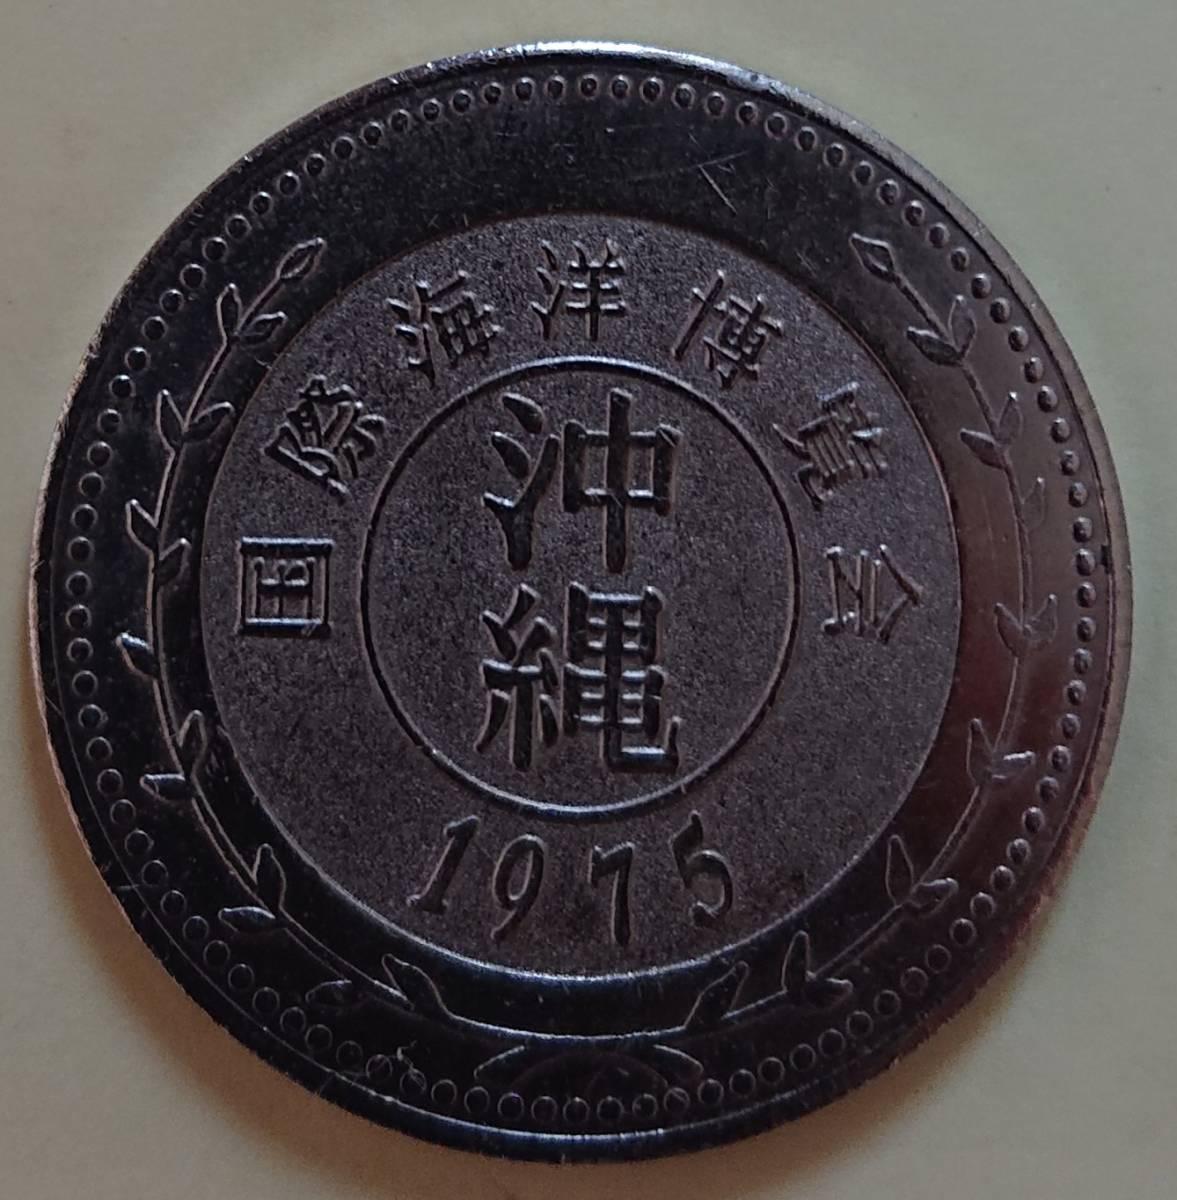 EXPO1975 沖縄国際海洋博覧会記念メダル(メダルのみ)_画像1